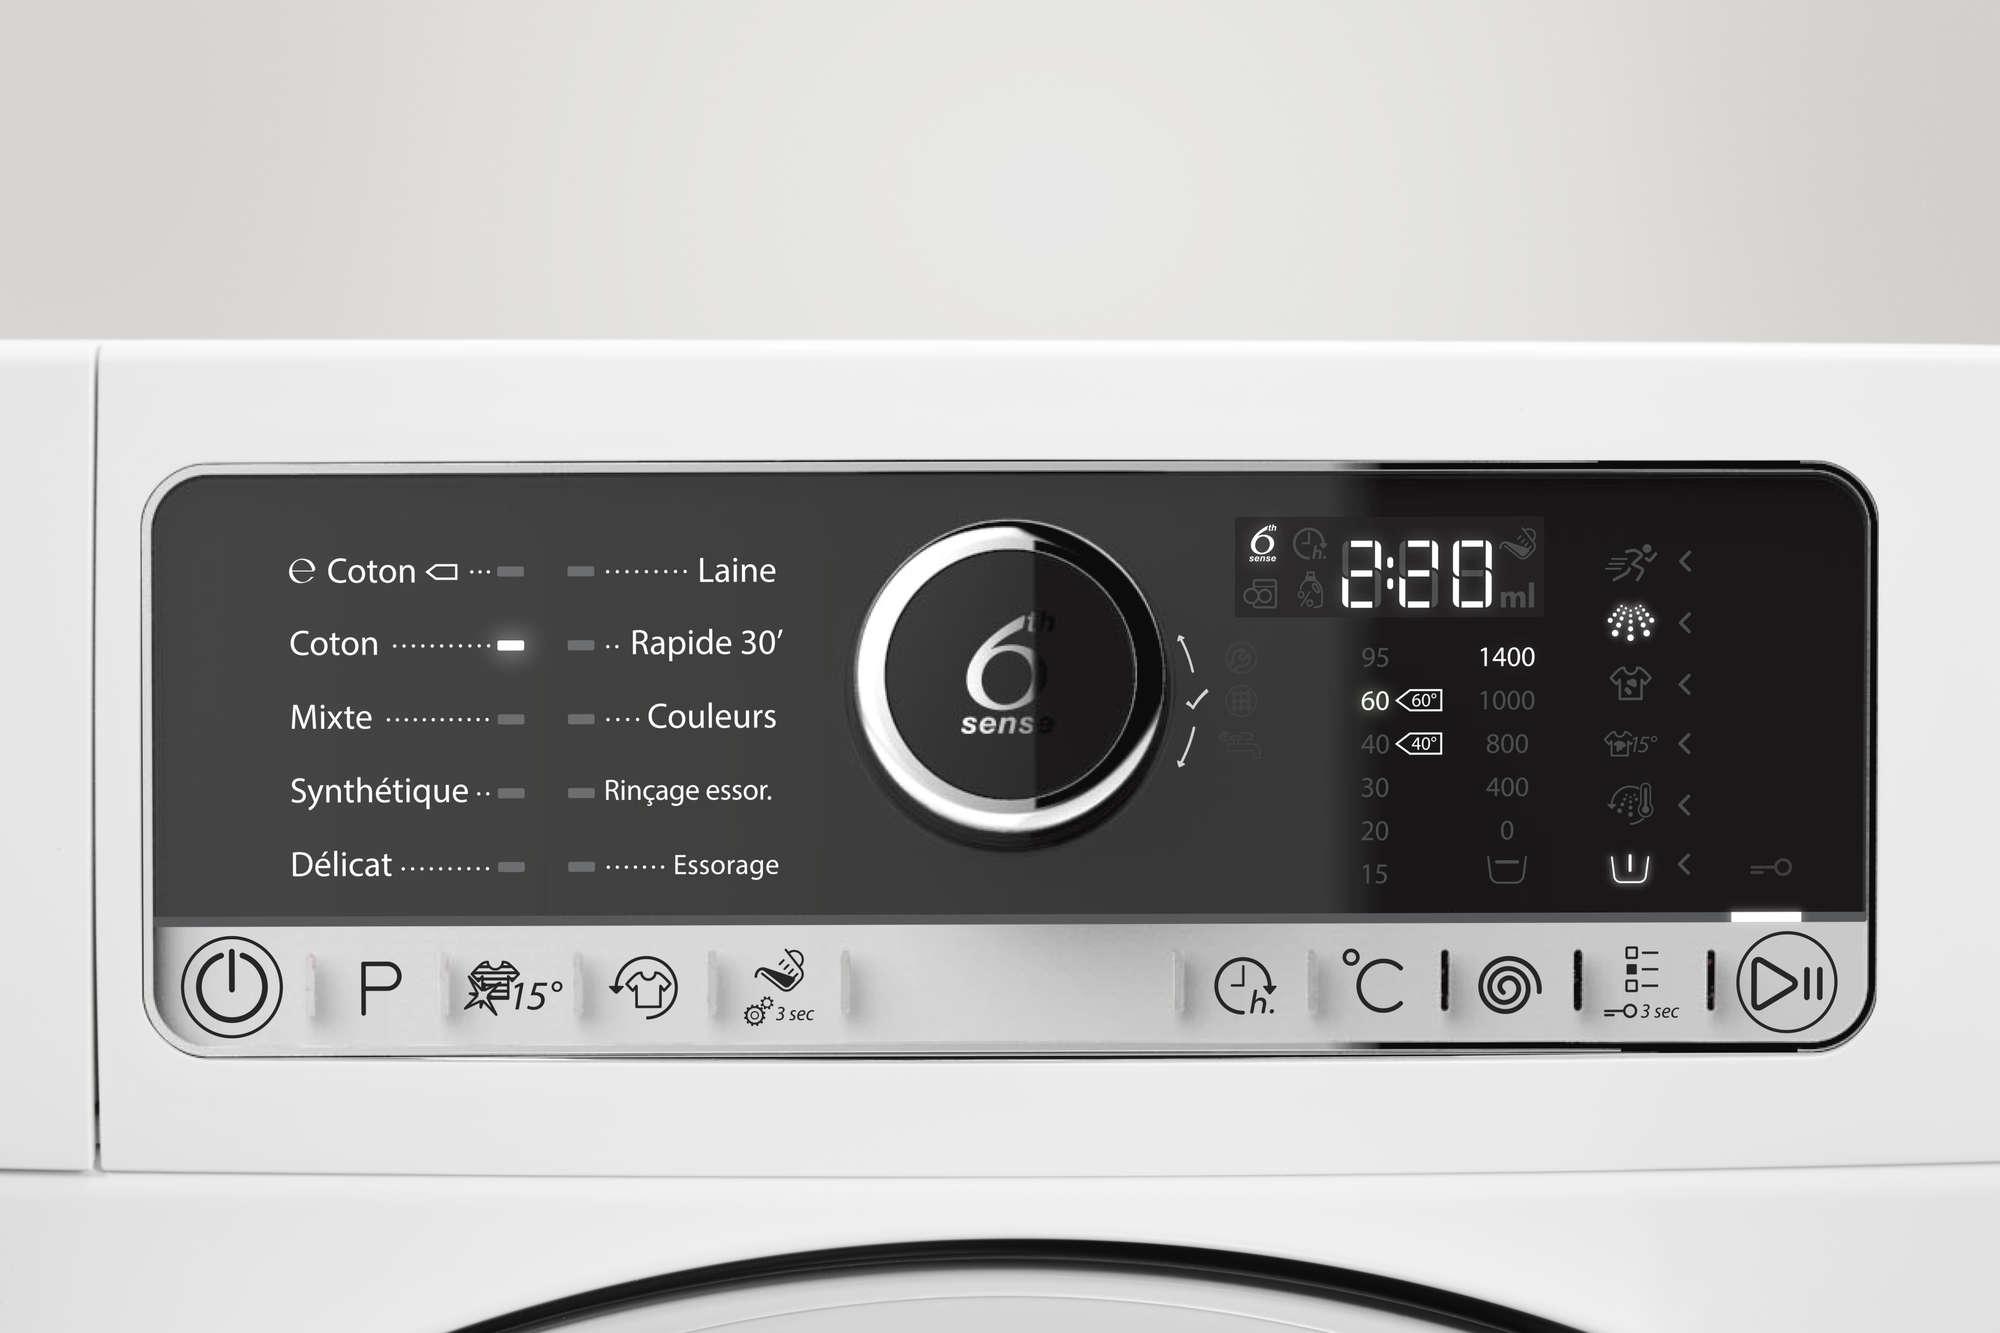 machine a laver whirlpool zen lave linge top whirlpool. Black Bedroom Furniture Sets. Home Design Ideas